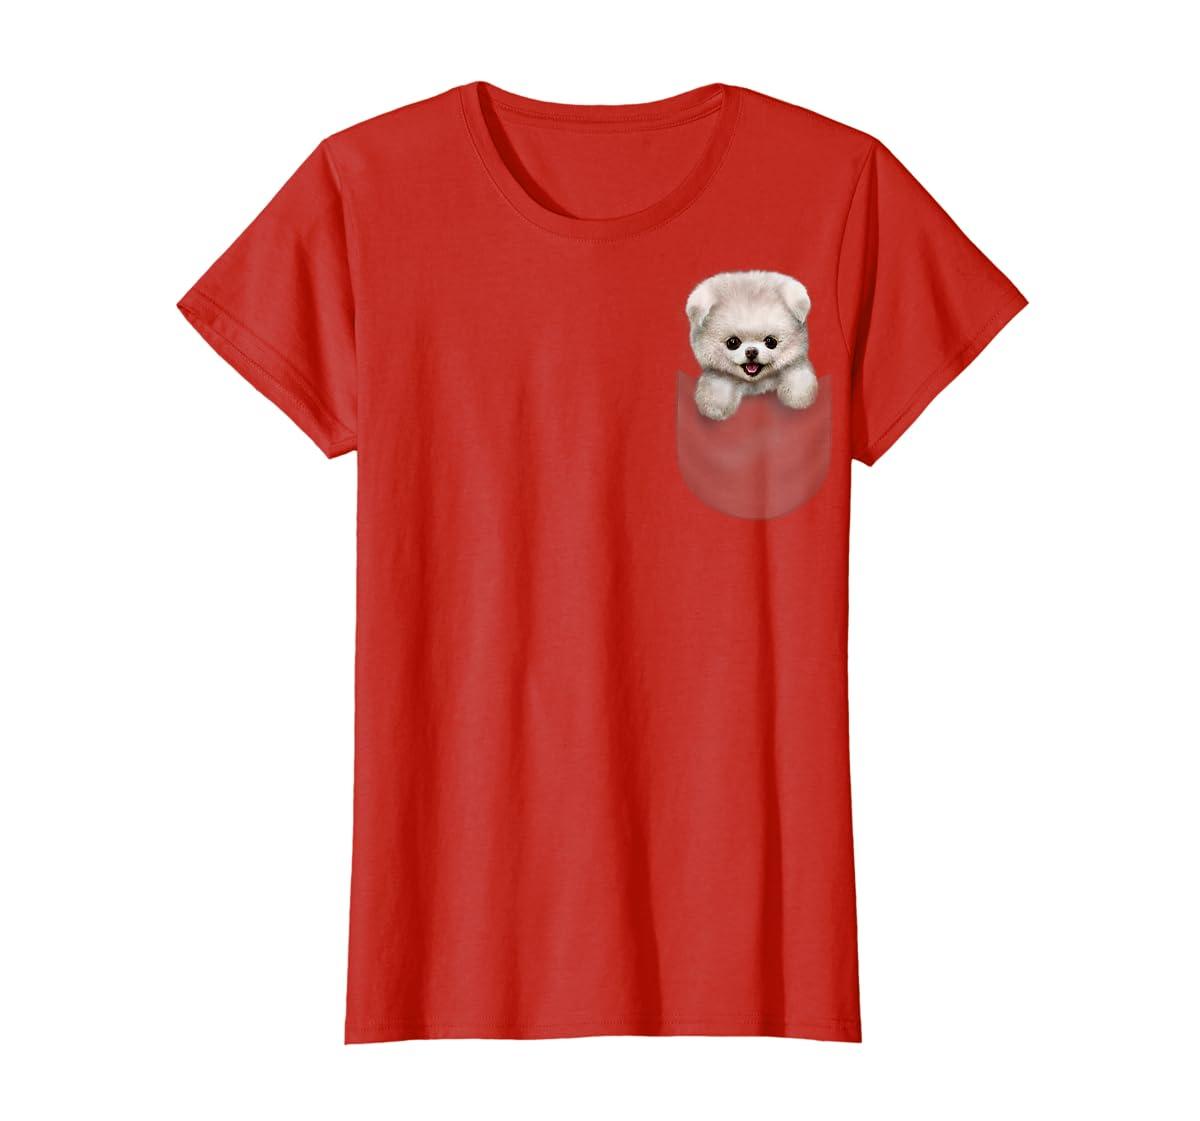 T-Shirt, Cute White Fluffy Pomeranian Puppy in Pocket, Dog-Women's T-Shirt-Red